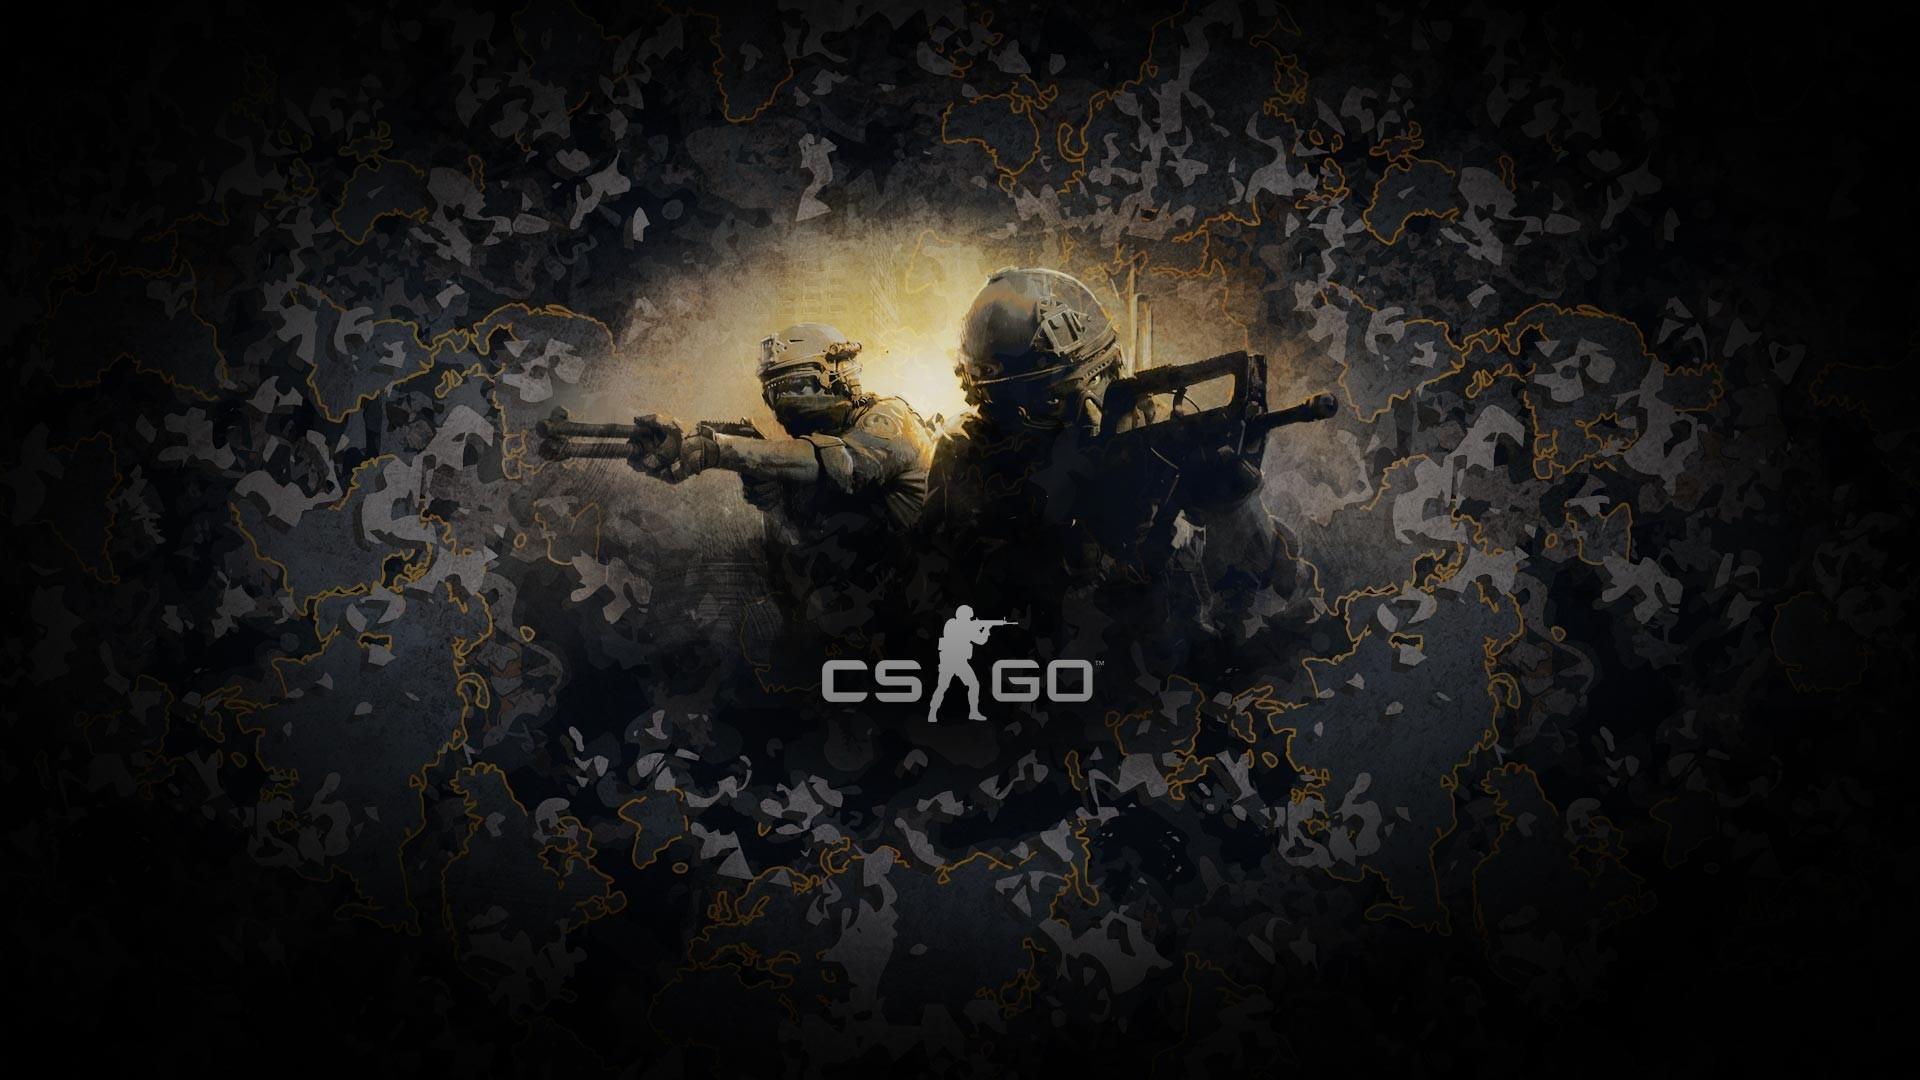 Csgo cool wallpaper